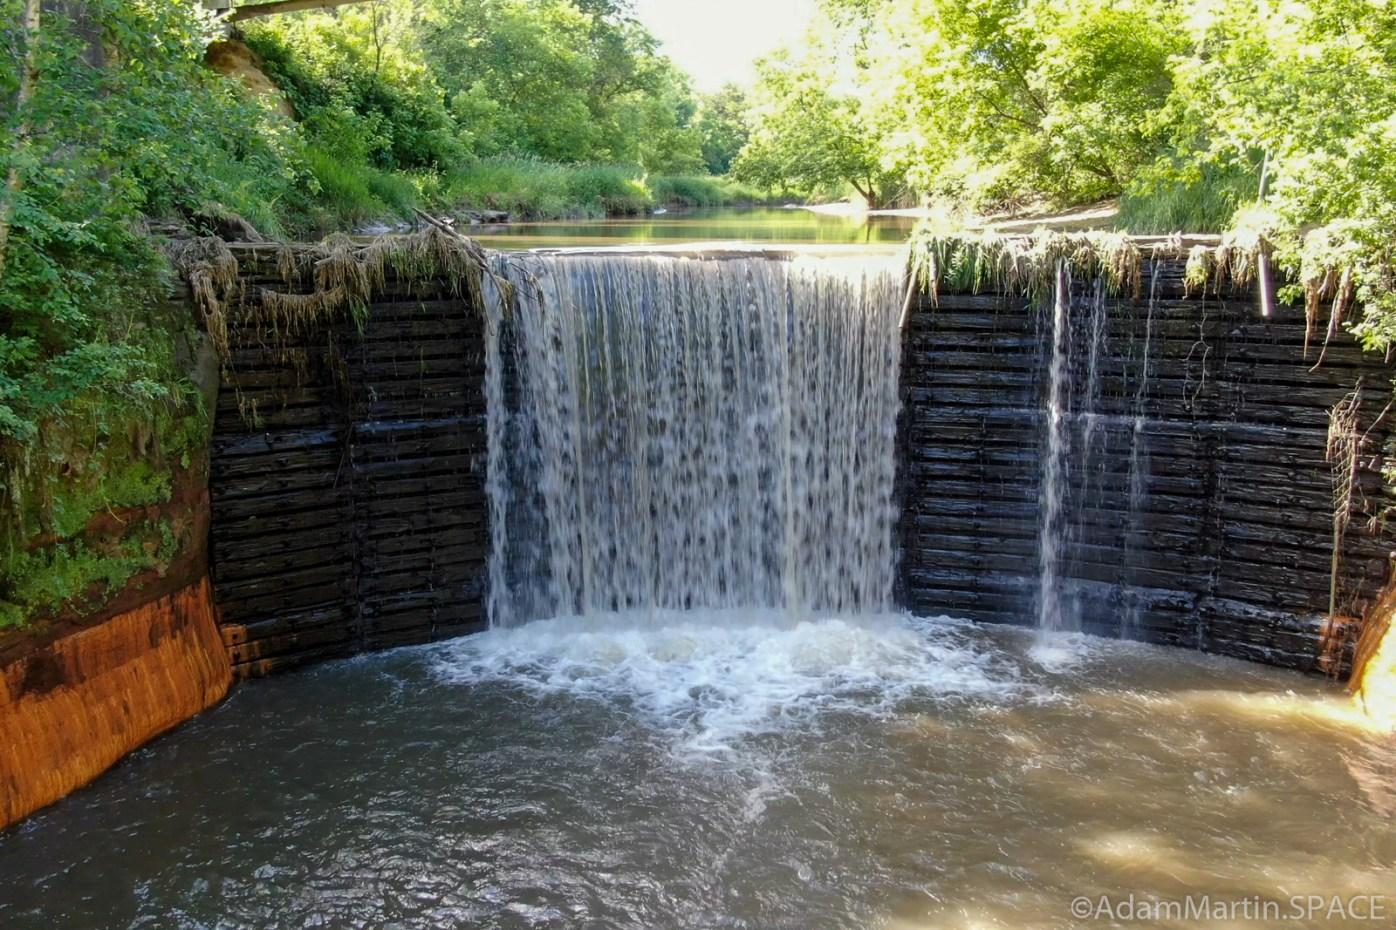 Douglas Mill Pond Spillway - Aerial view via Mavic 2 Zoom